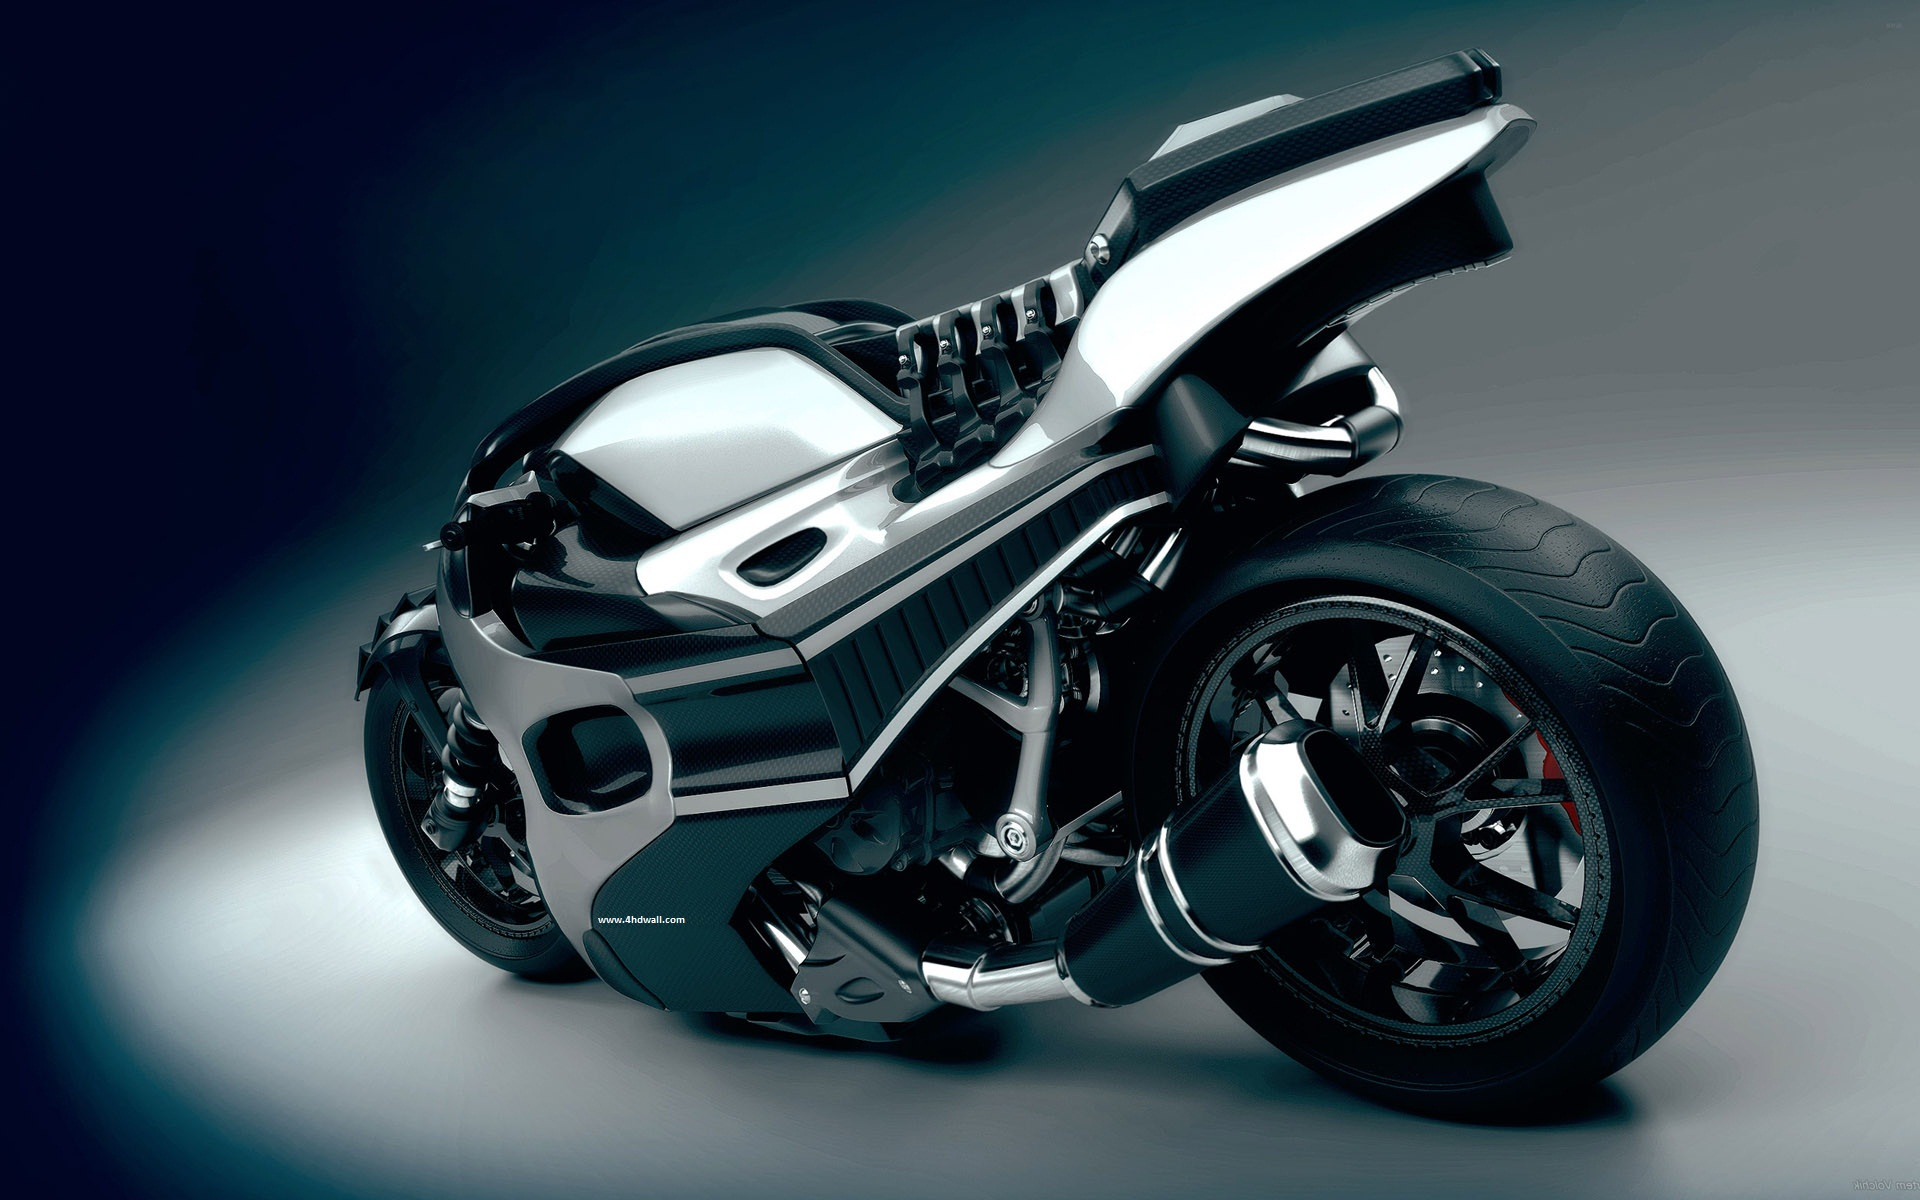 motor-bikes-hd-wallpapers | itsmyideas : great minds discuss ideas